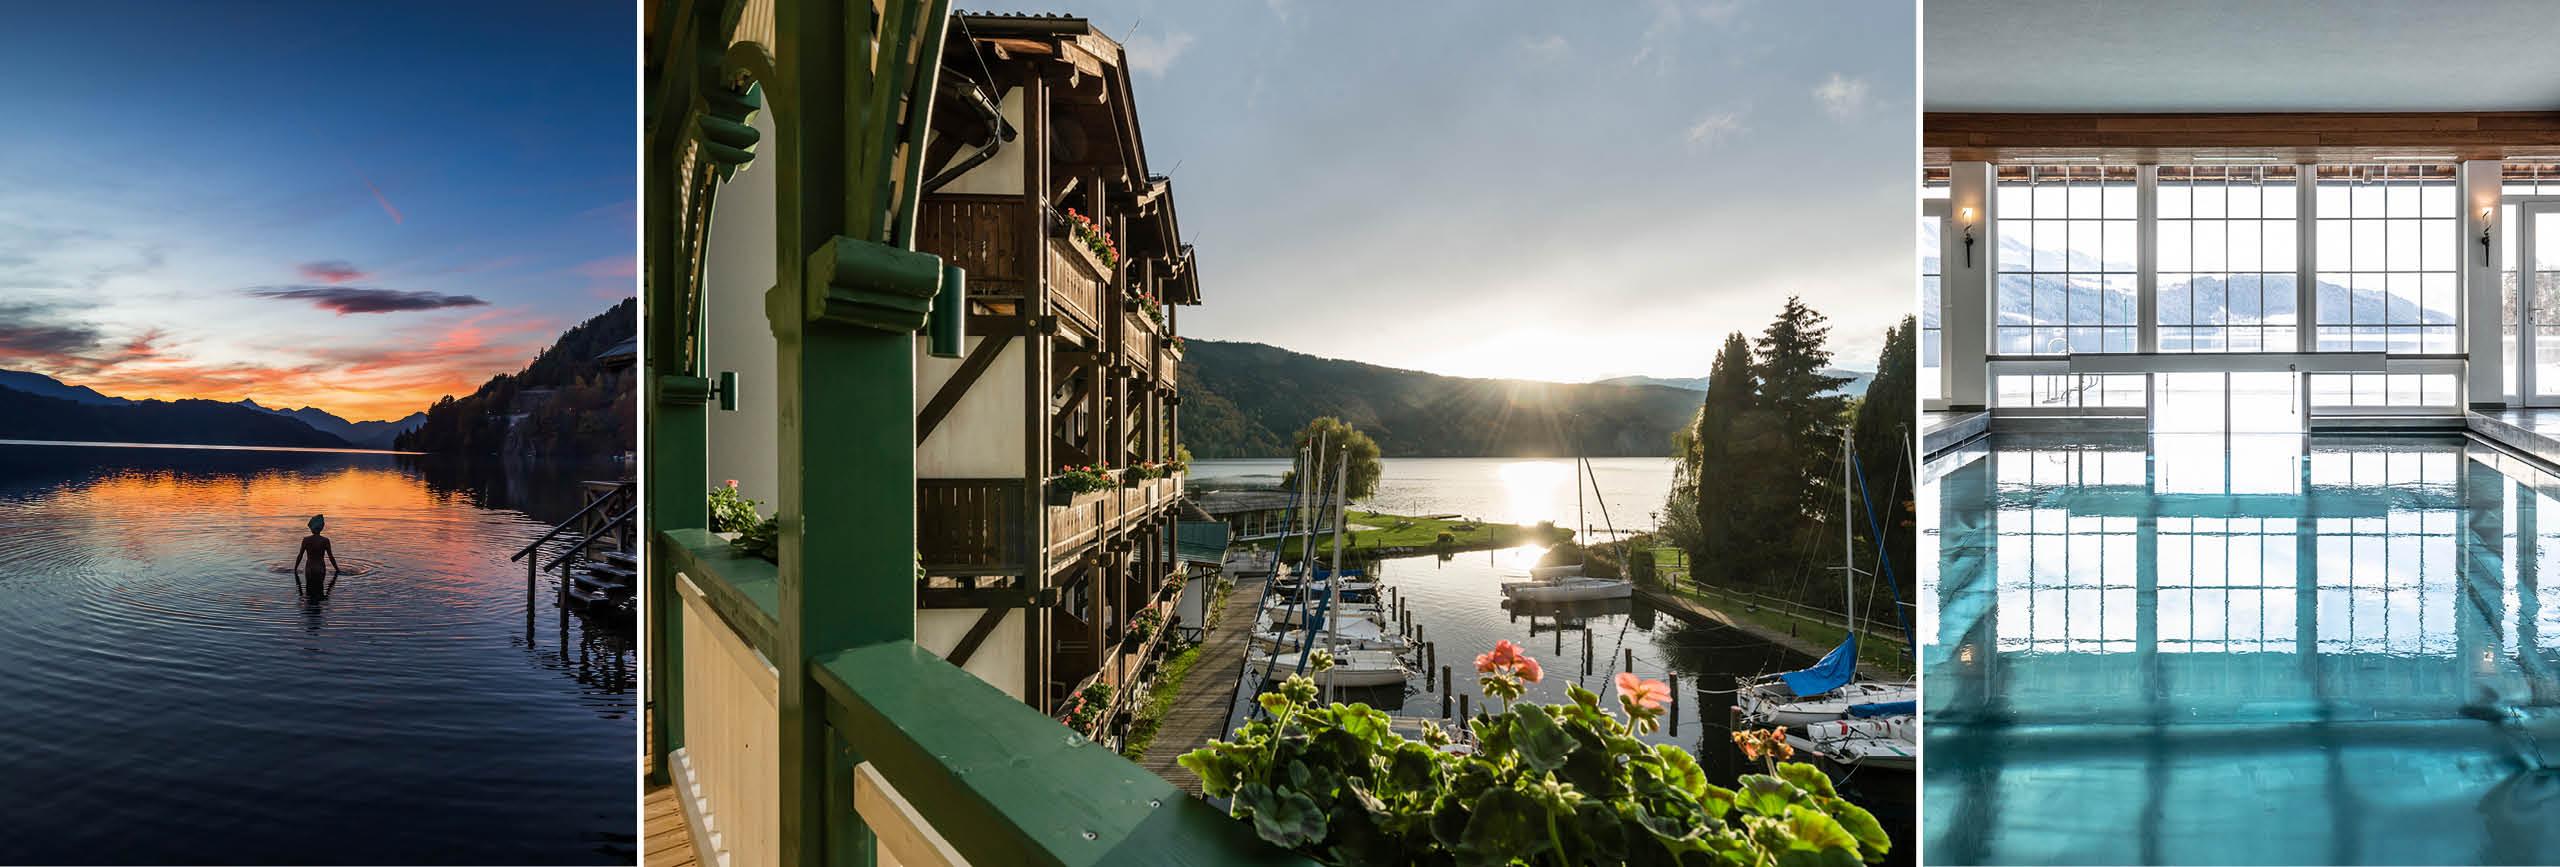 Romantik-Spa-Hotel Seefischer****